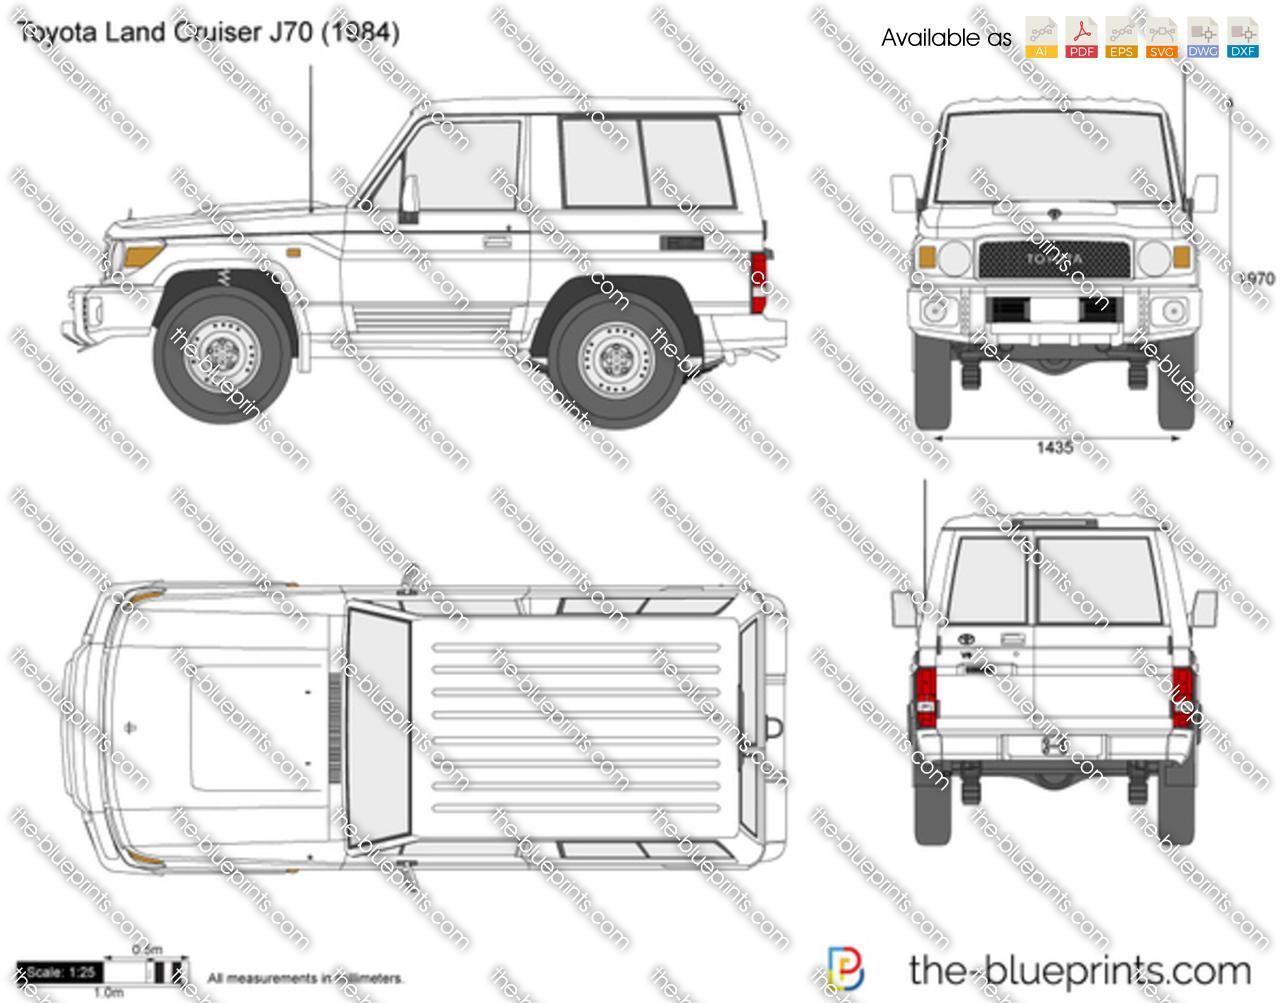 Toyota Land Cruiser J70 Swb Vector Drawing